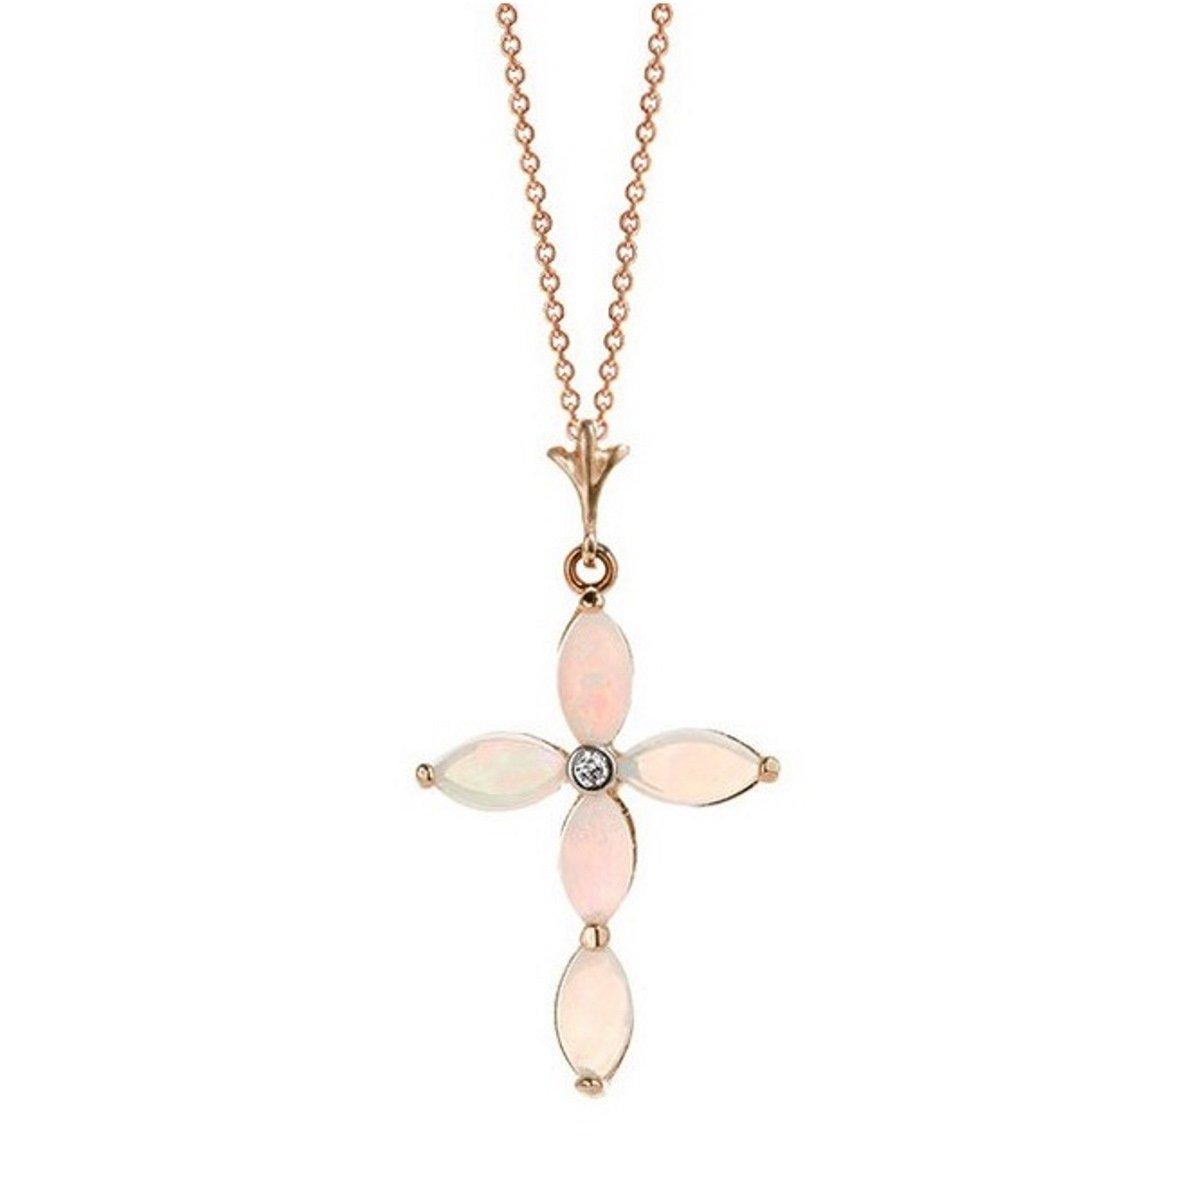 Opal Diamond Cross Pendant Necklace Solid 14K Rose Gold 2191-R